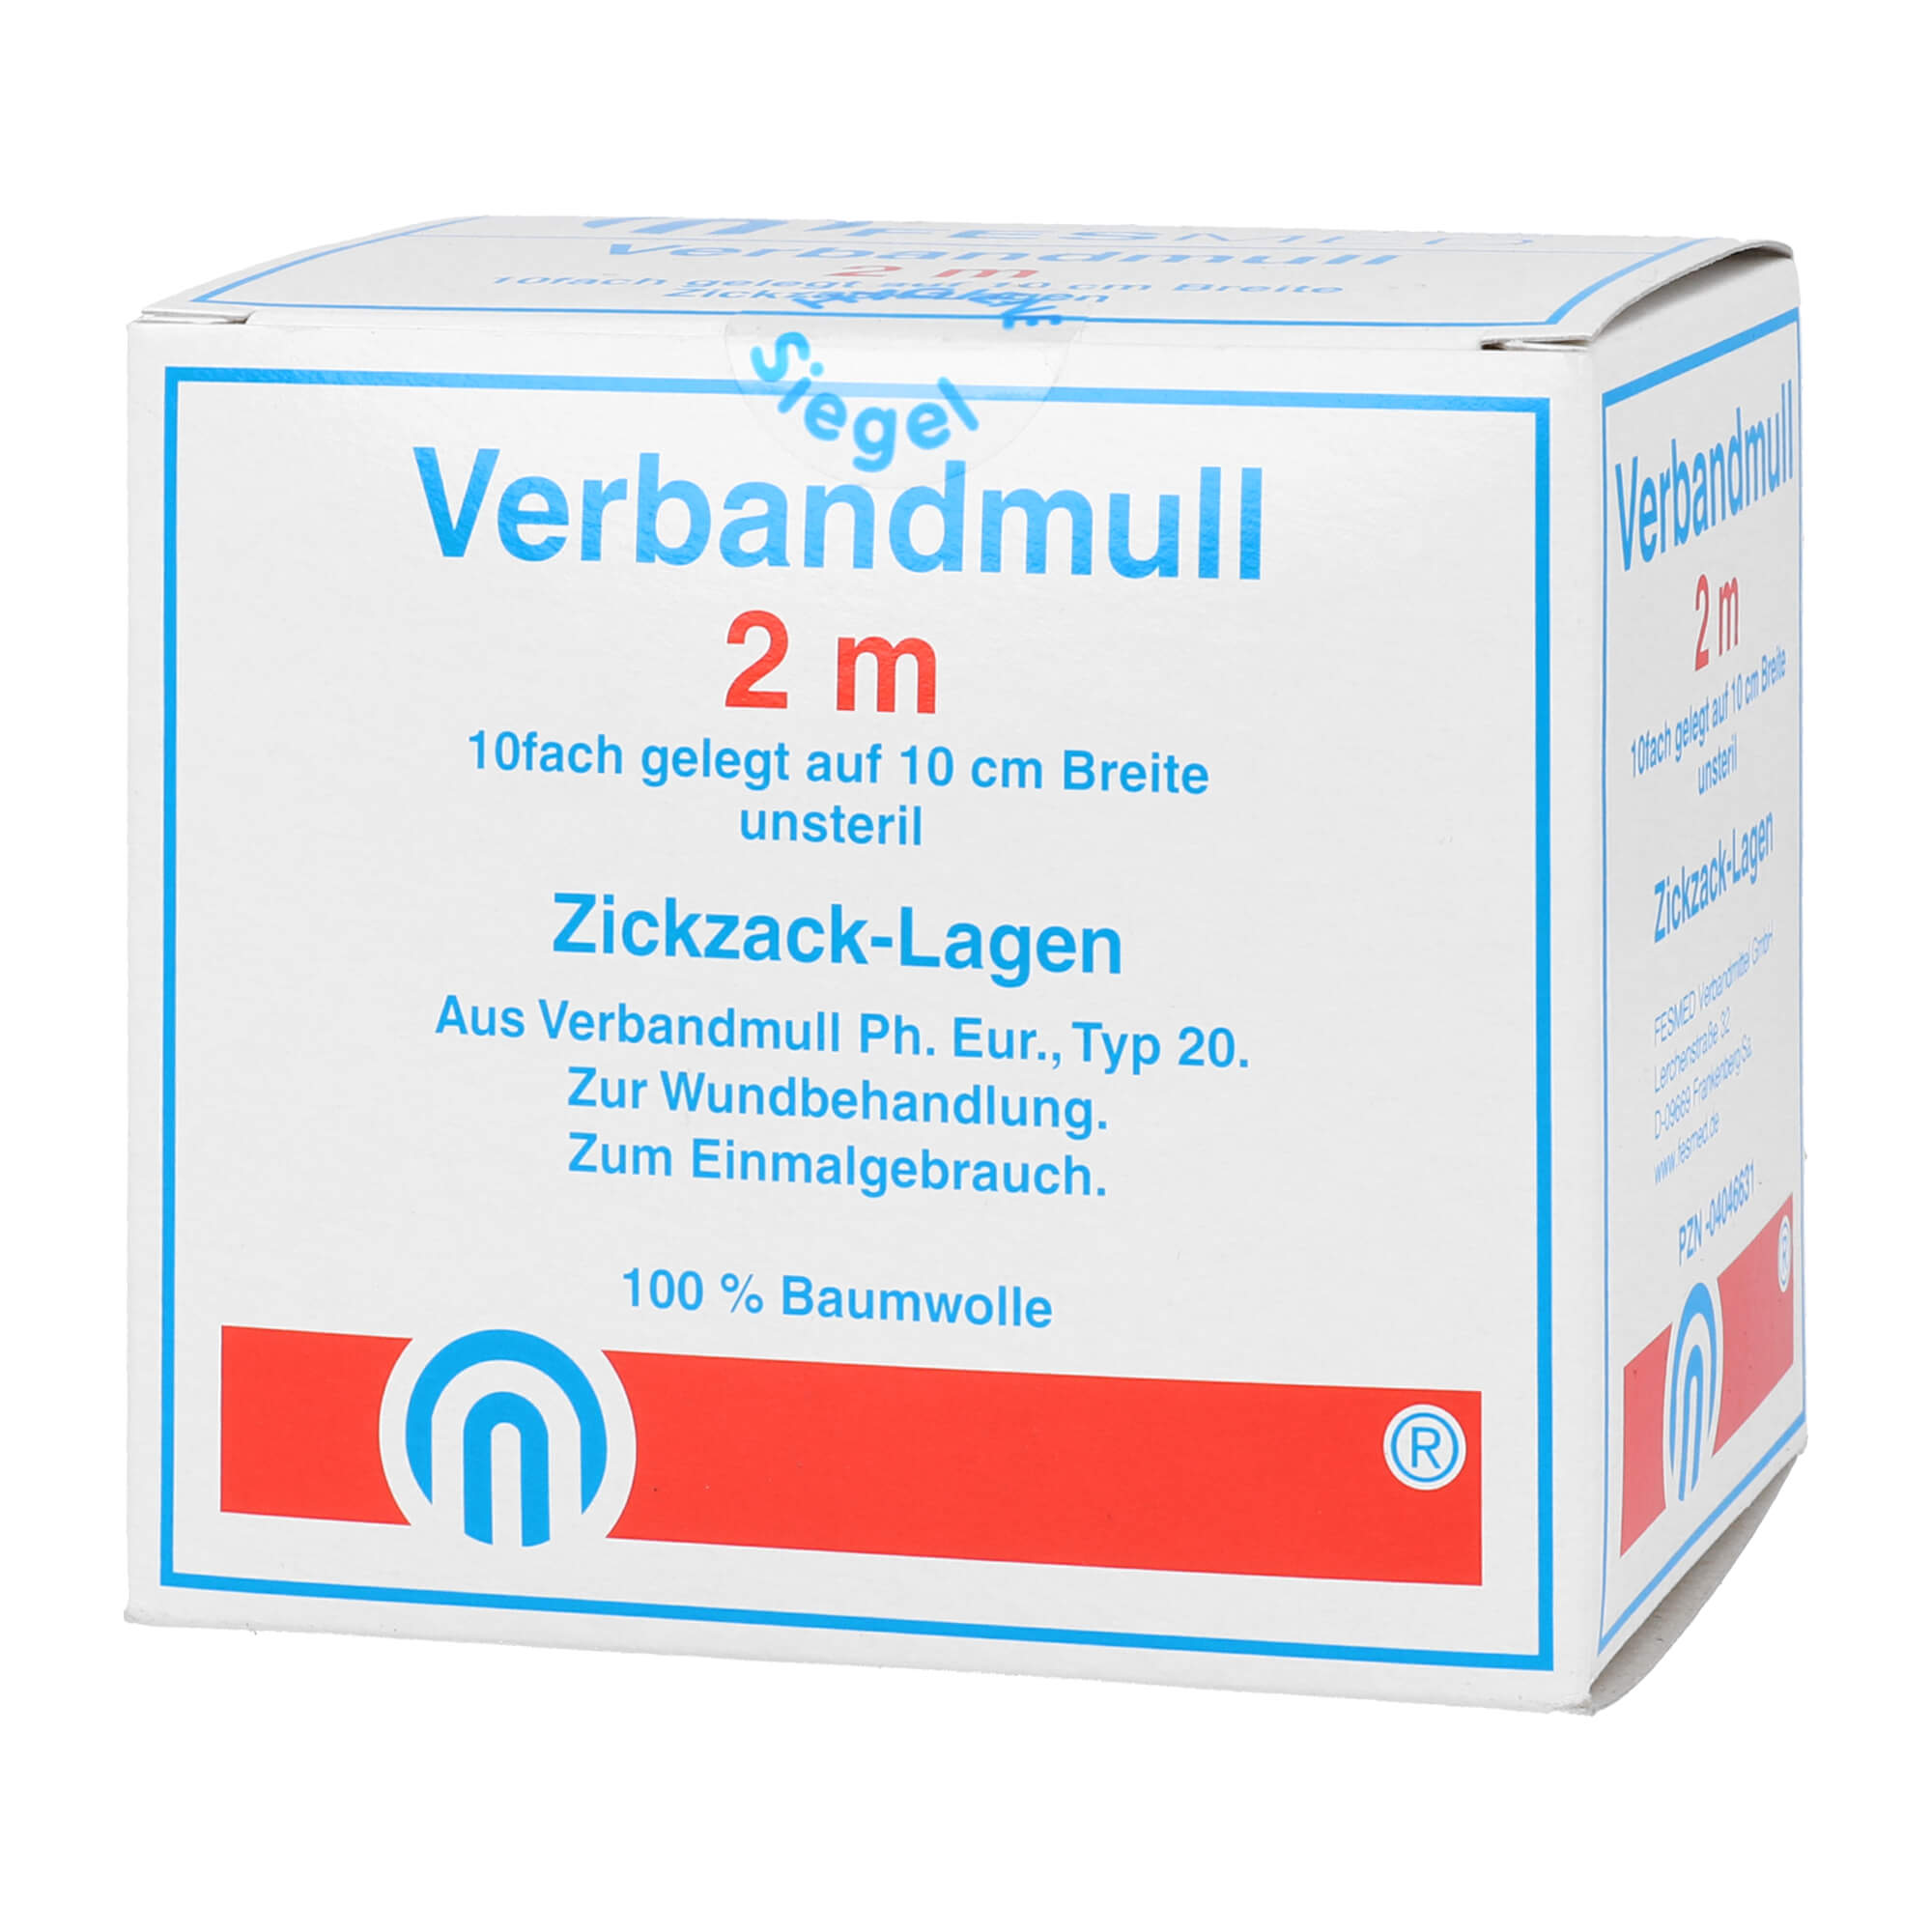 Verbundmull 2x1 m zickzack BW 20/100 unsteril